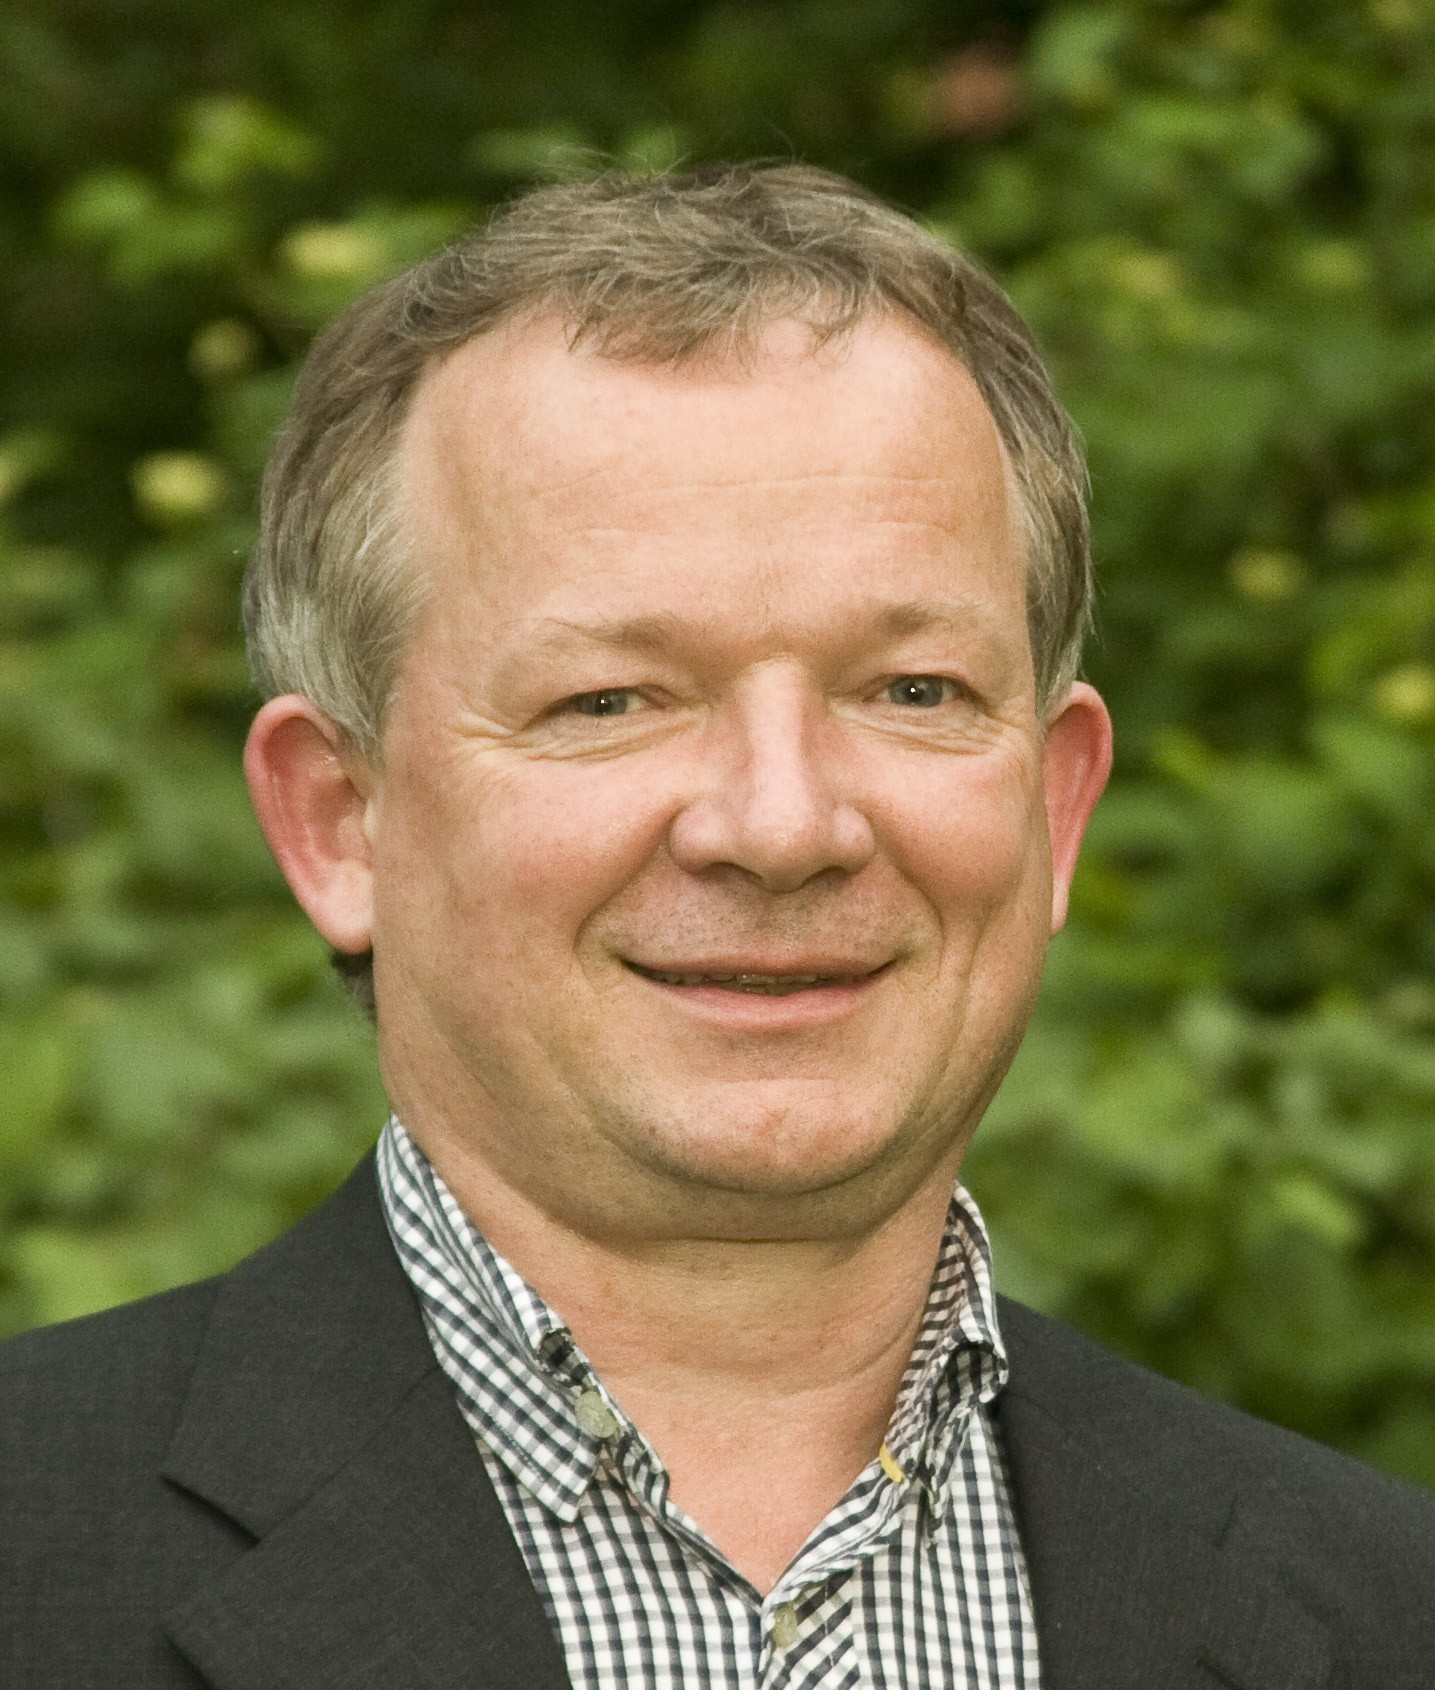 Horst Göbel